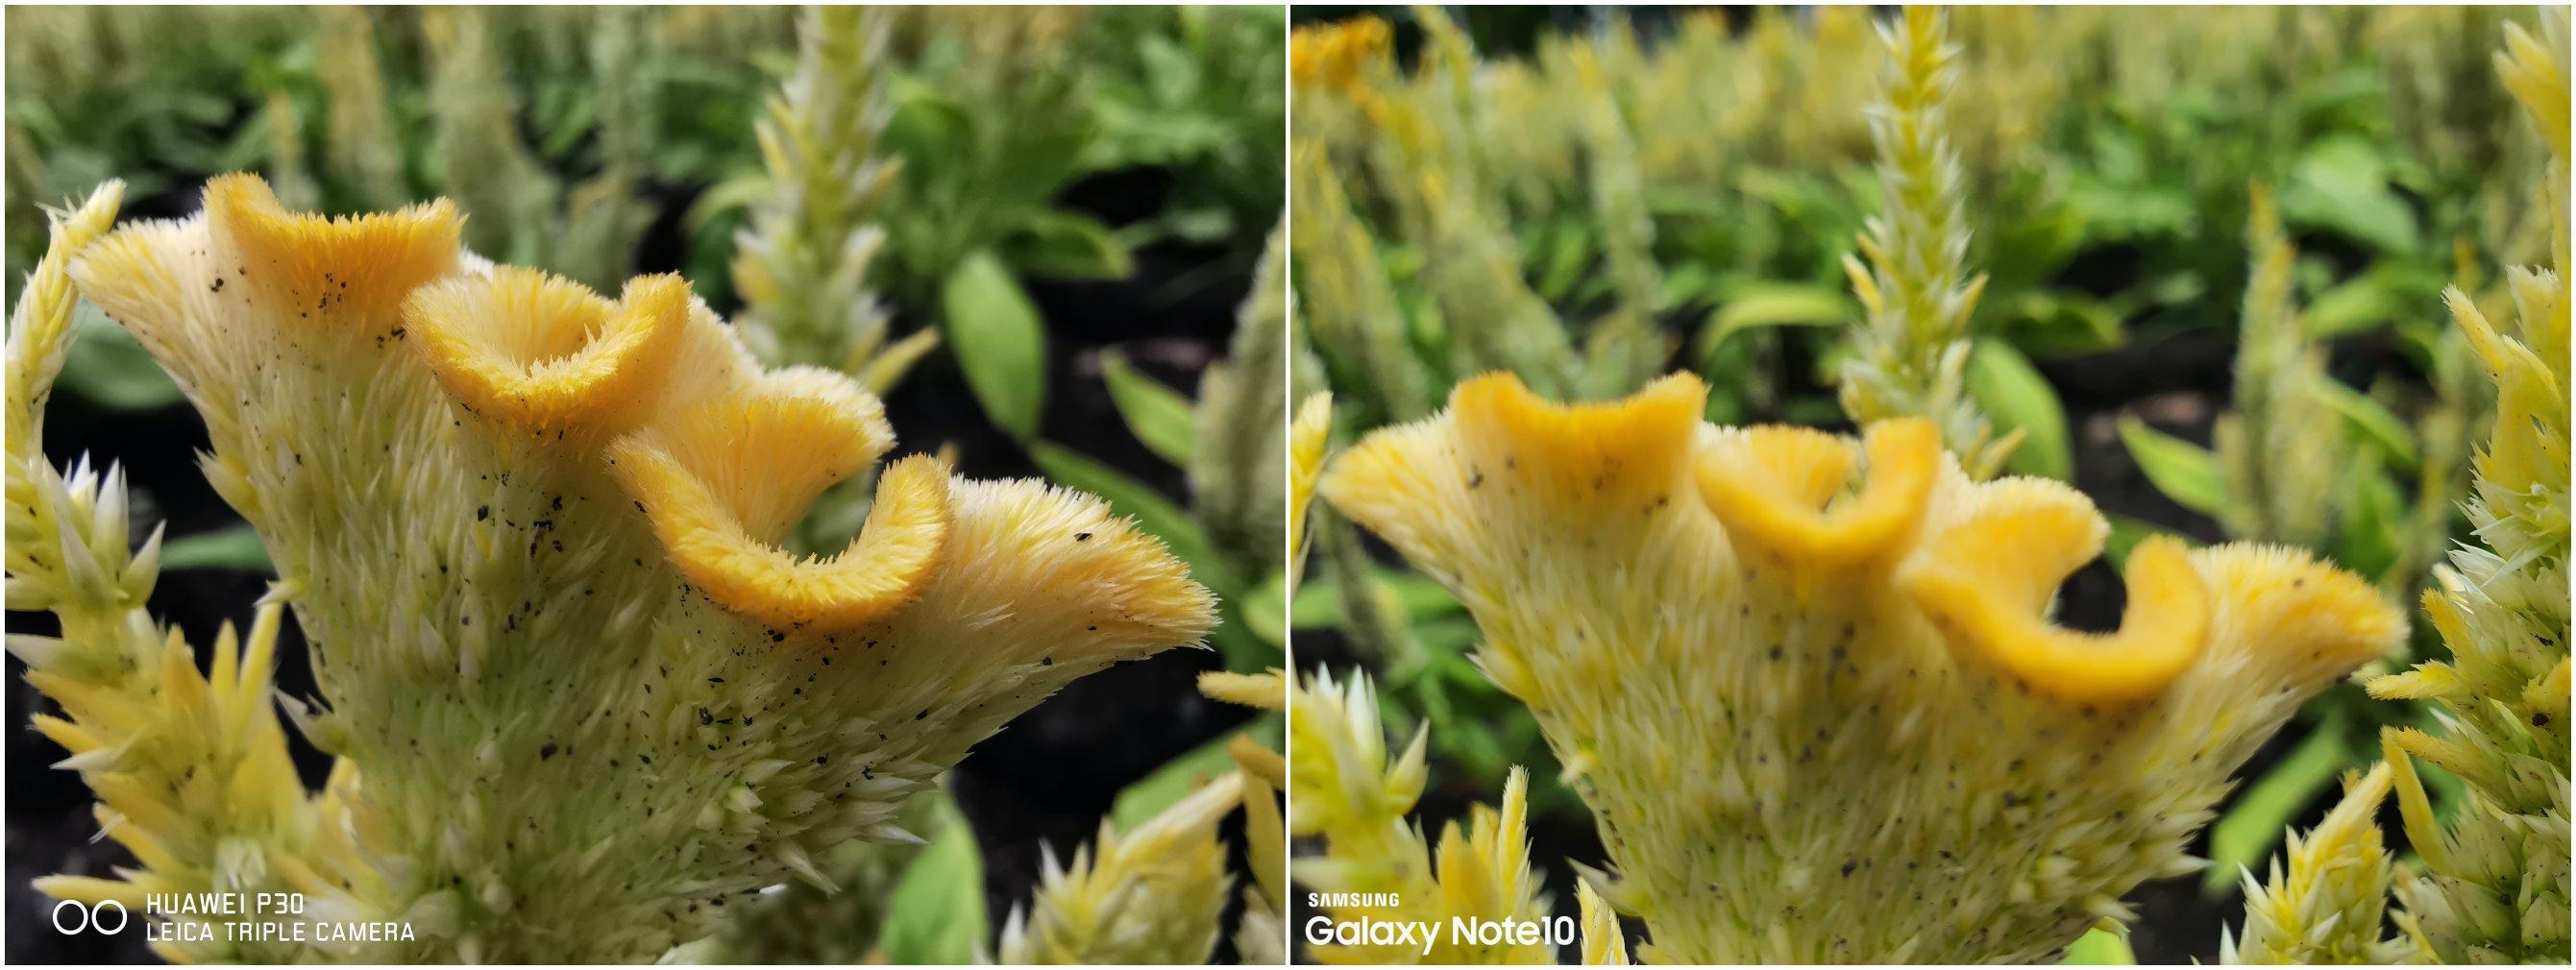 Camera Battle Galaxy Note 10 vs HUAWEI P30 SpecPhone 0008